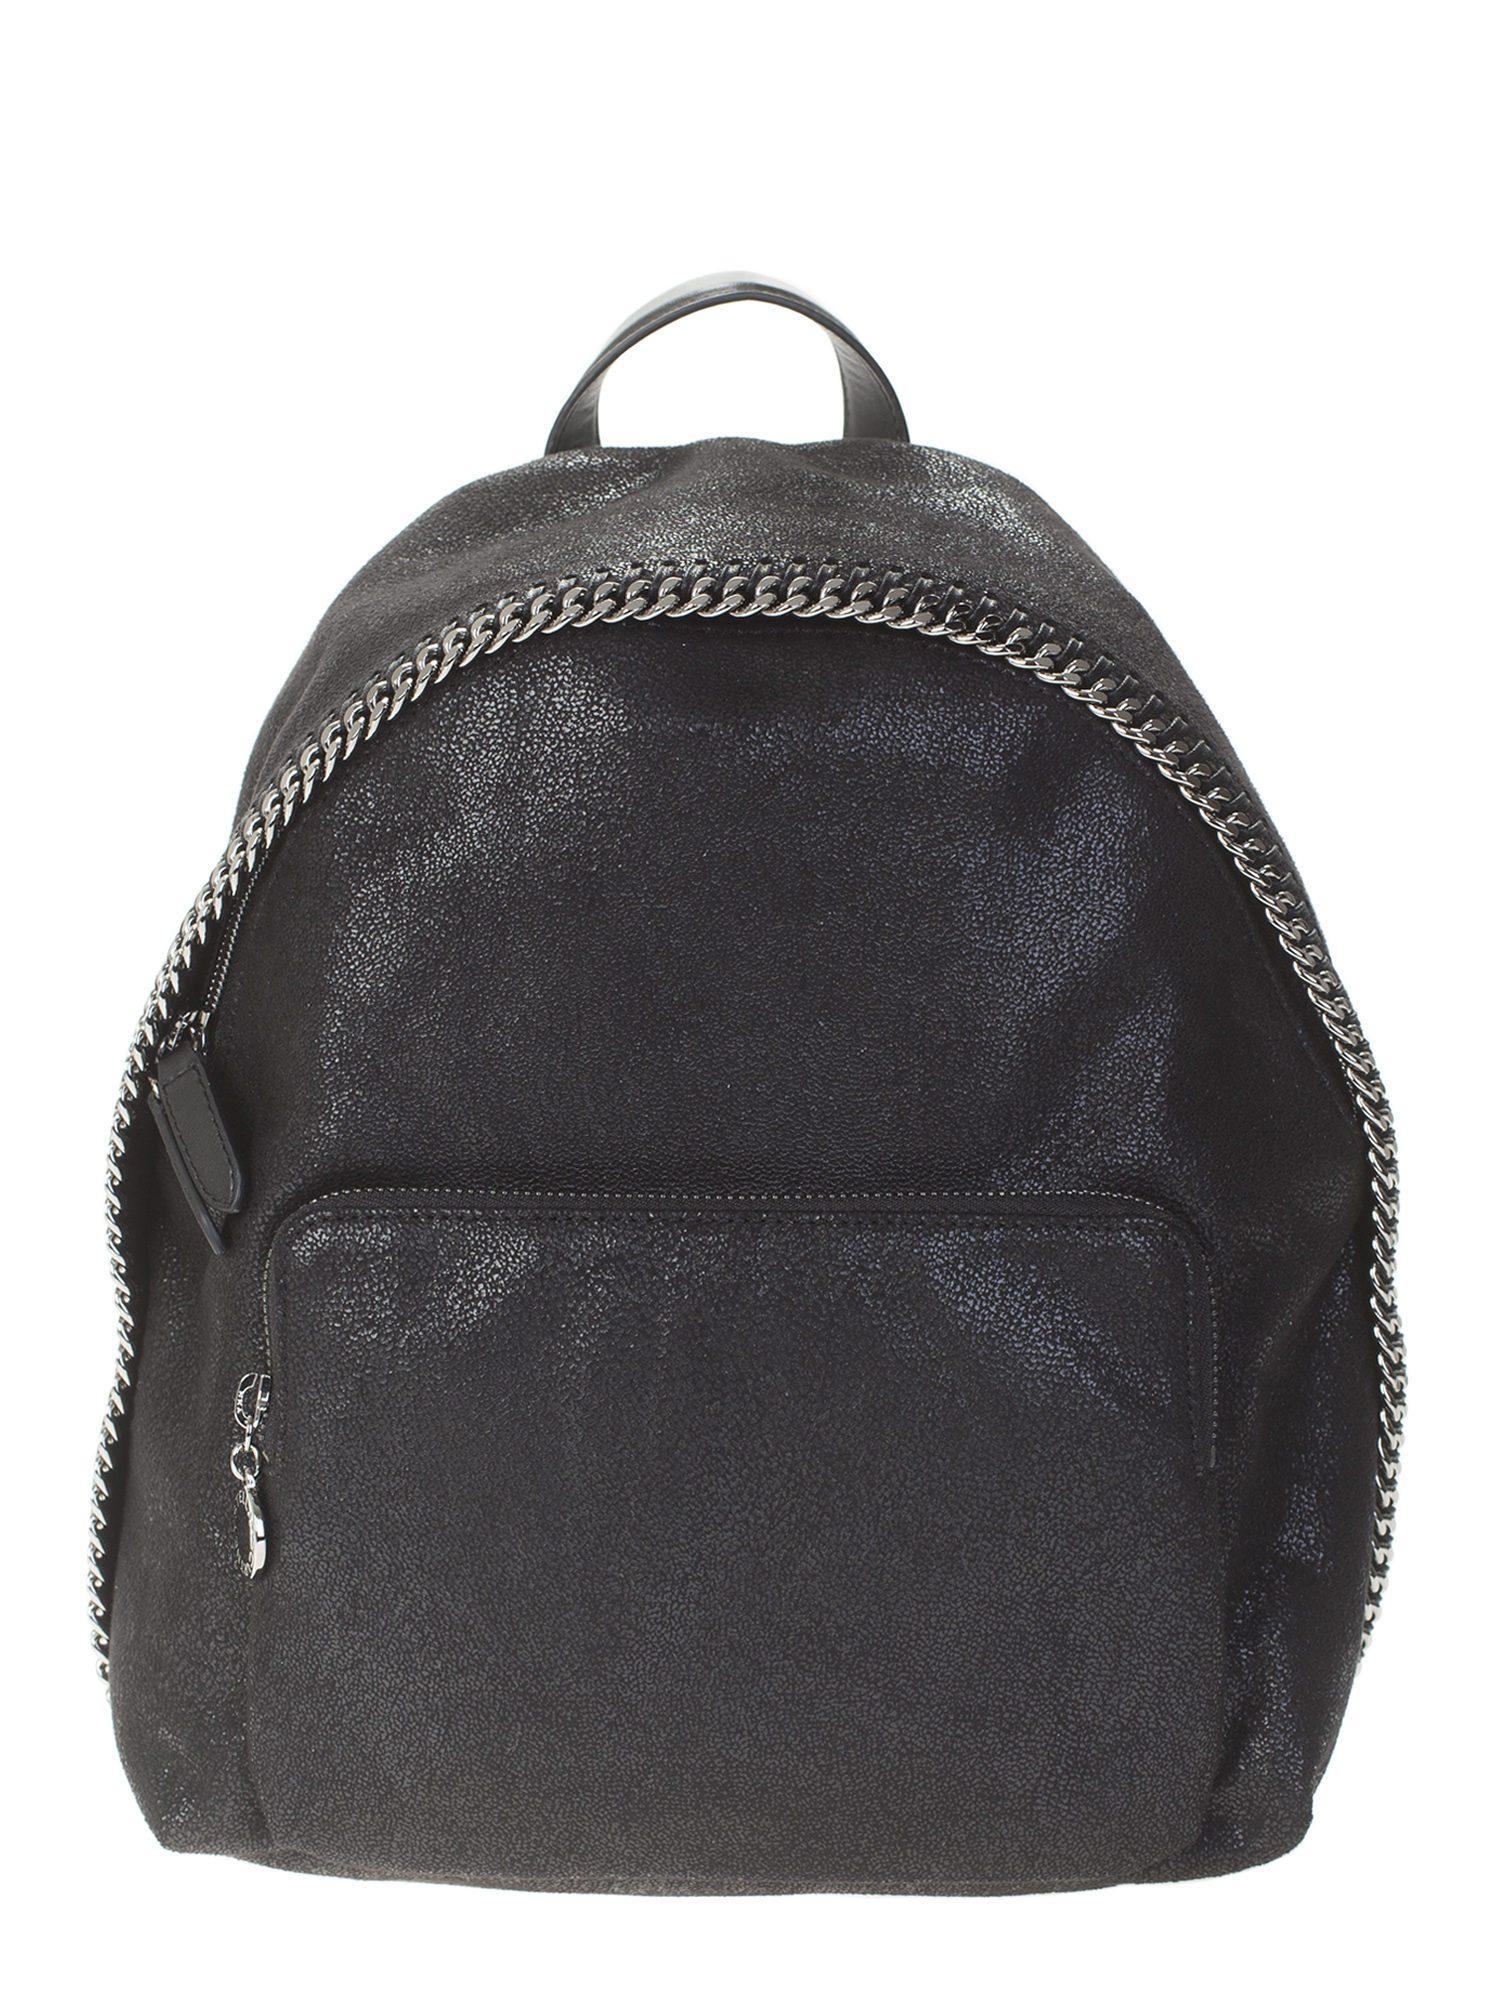 56552a732d56 Stella McCartney. Women s Black Falabella Shaggy Deer Faux Leather Backpack